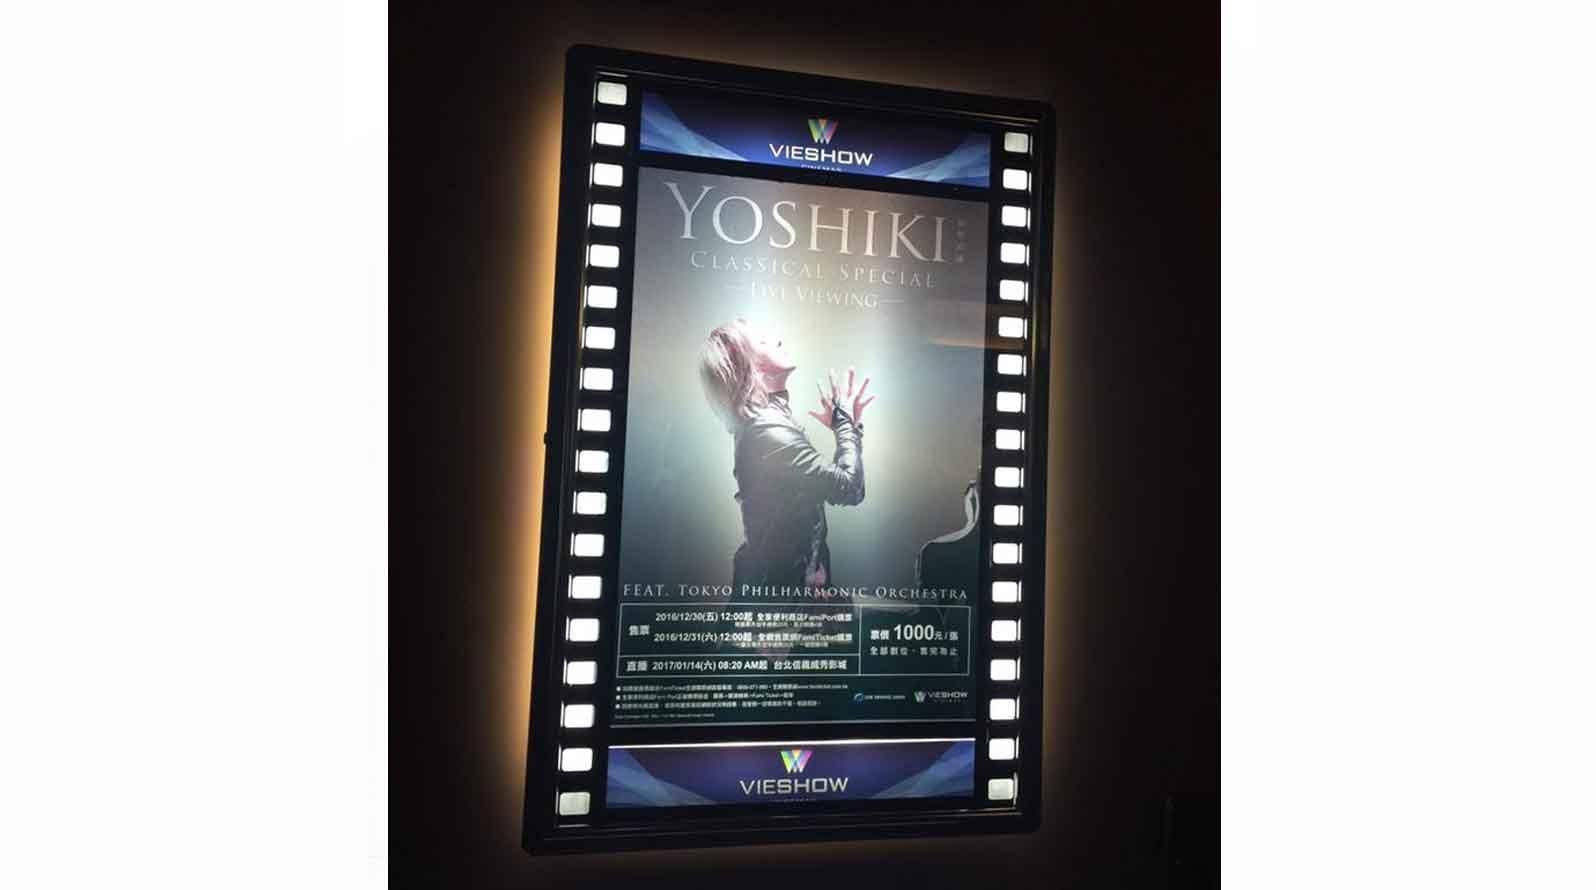 YOSHIKI於Carnegie Hall(卡內基廳)演出第二日台灣電影院直播報導